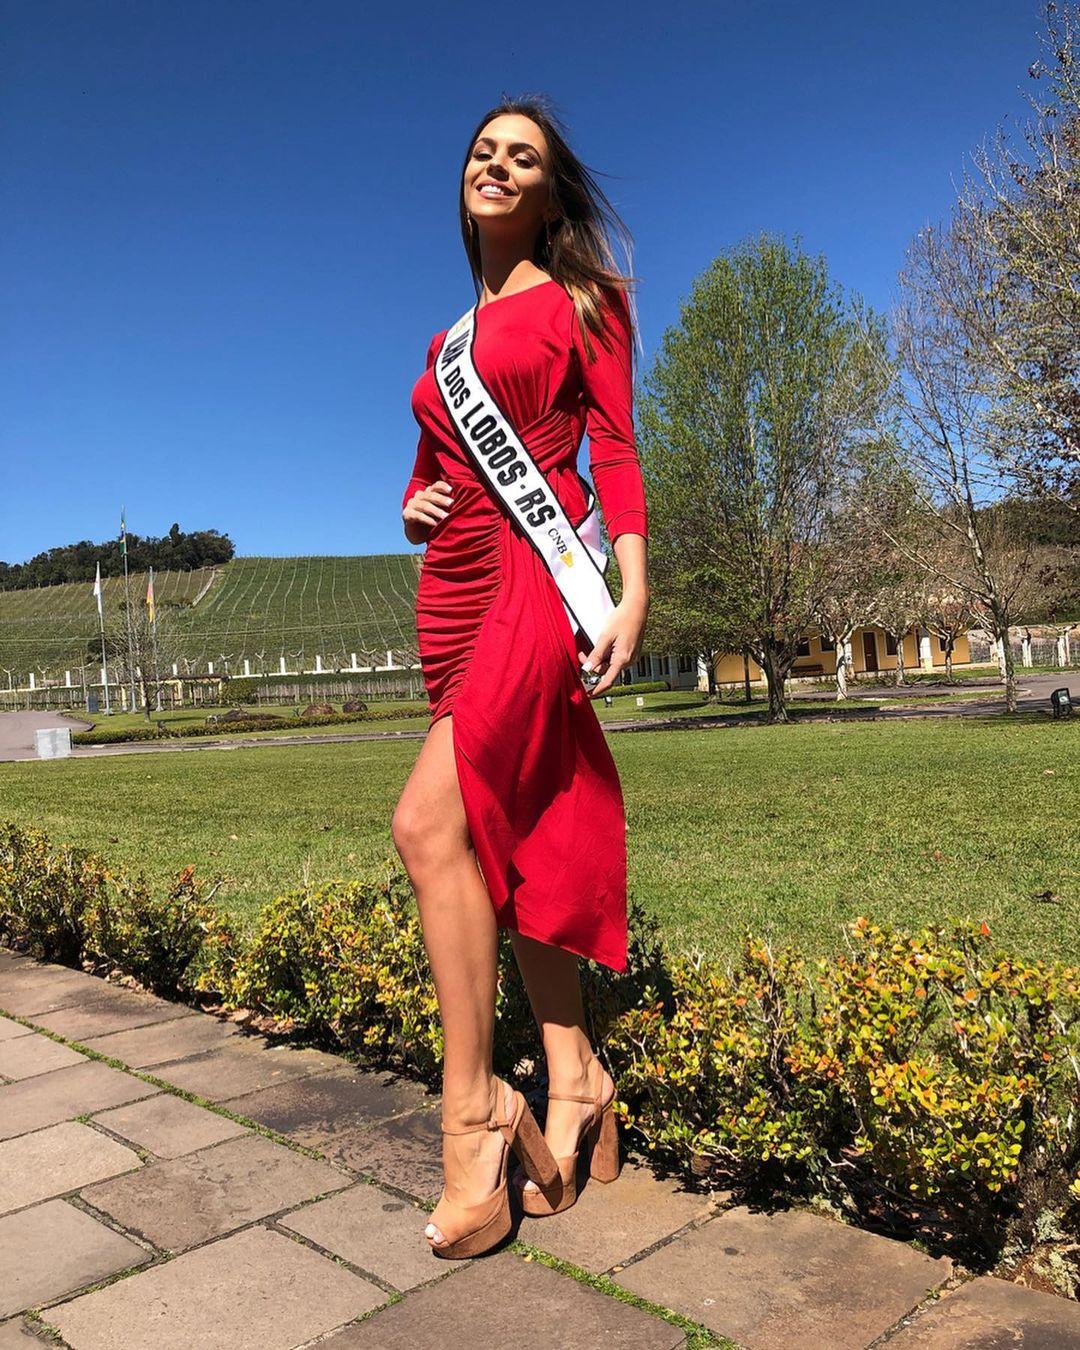 ana flavia giacomini, miss ilha dos lobos mundo 2019. - Página 8 Fwxml710